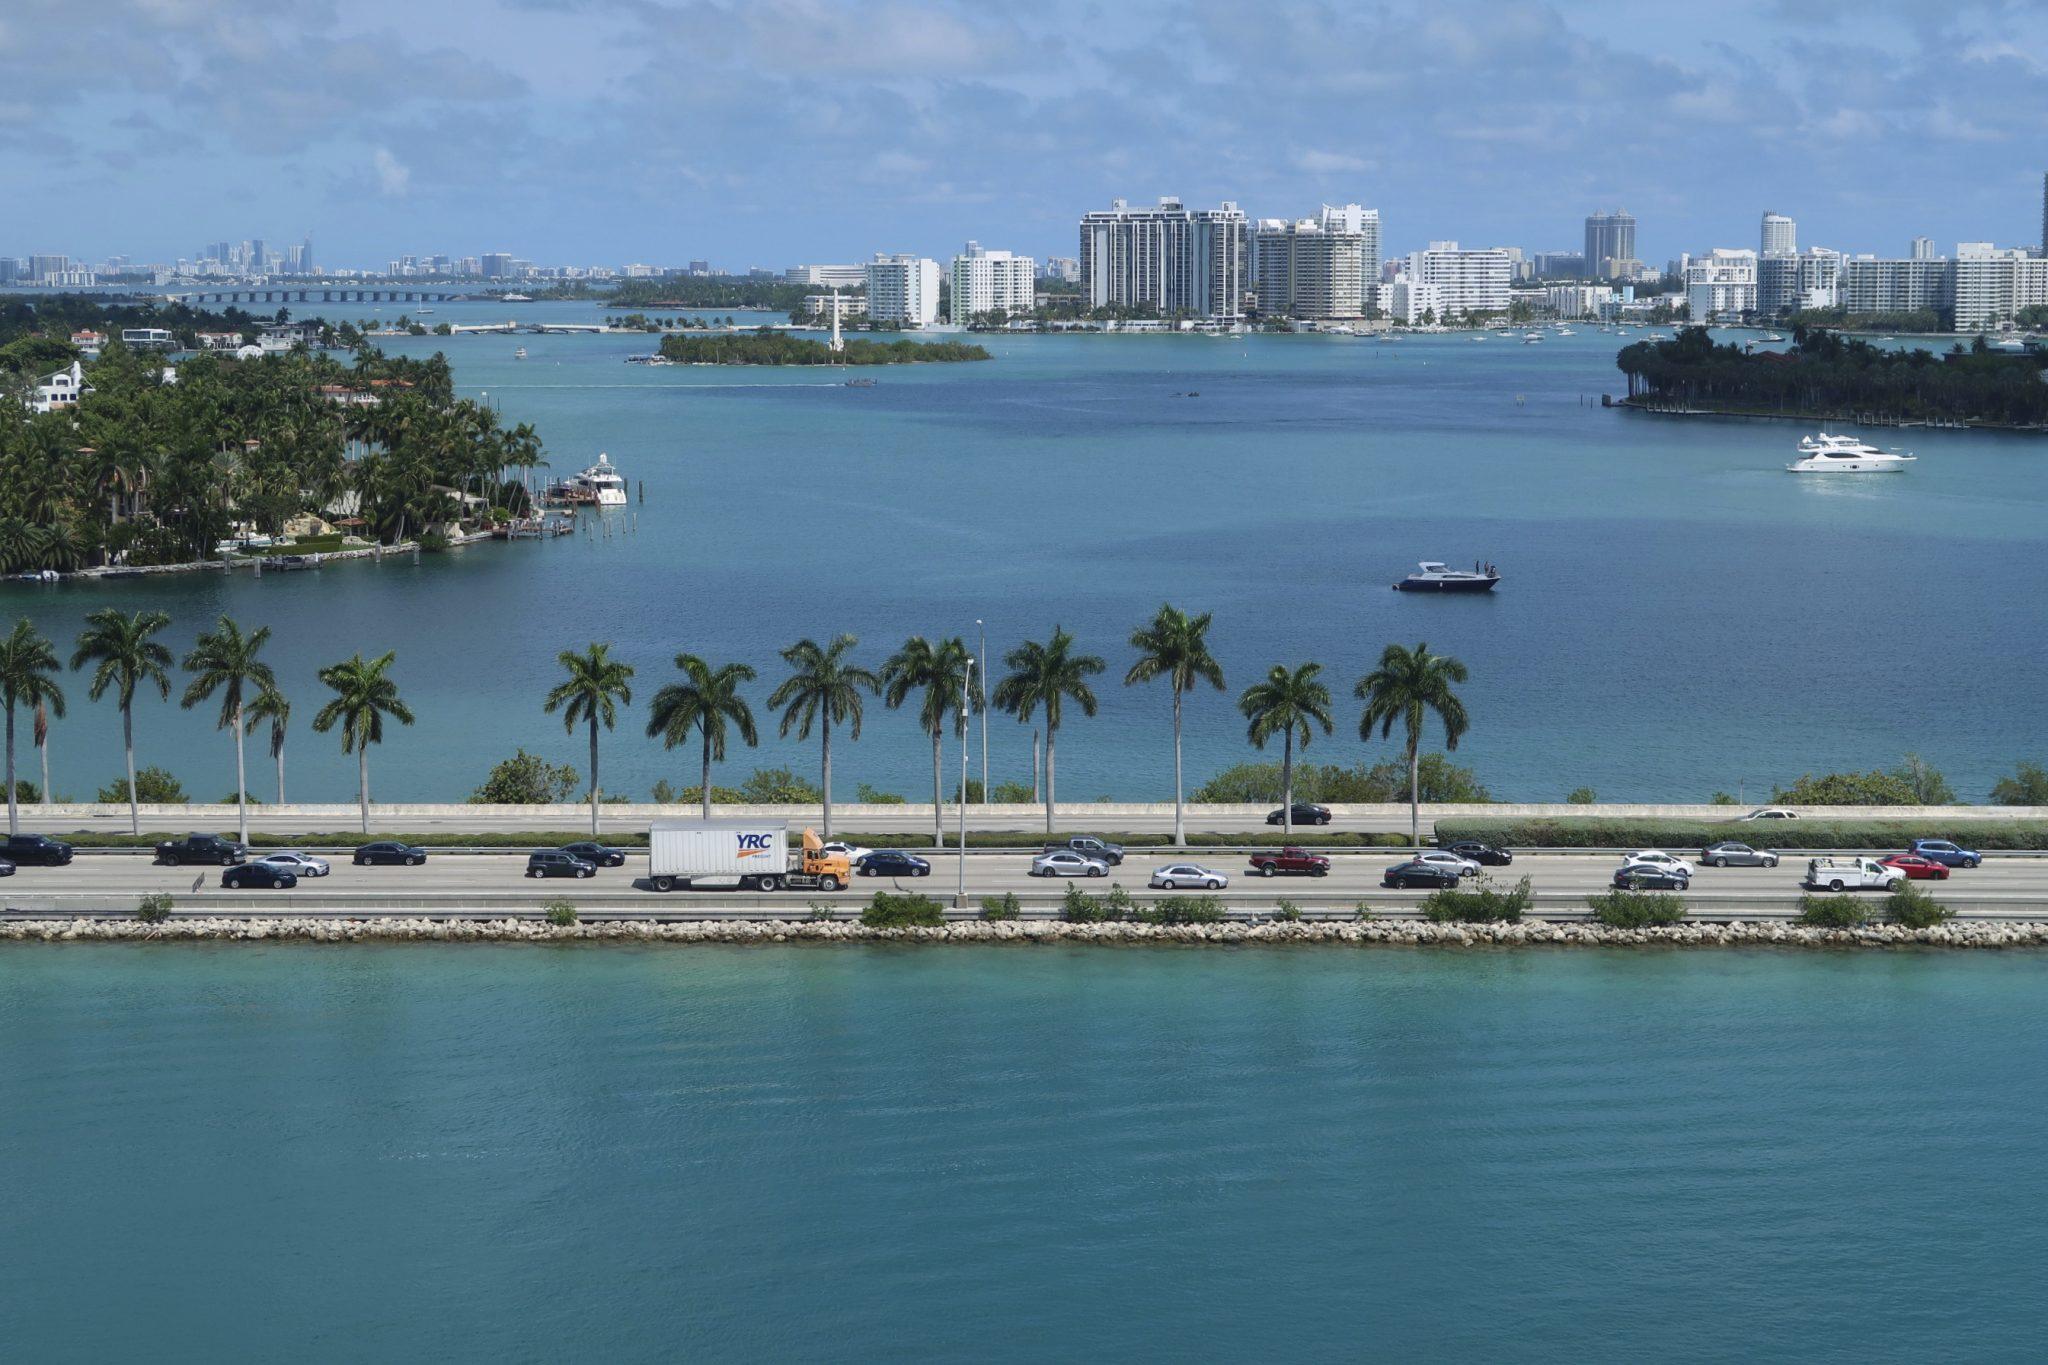 Miami satama